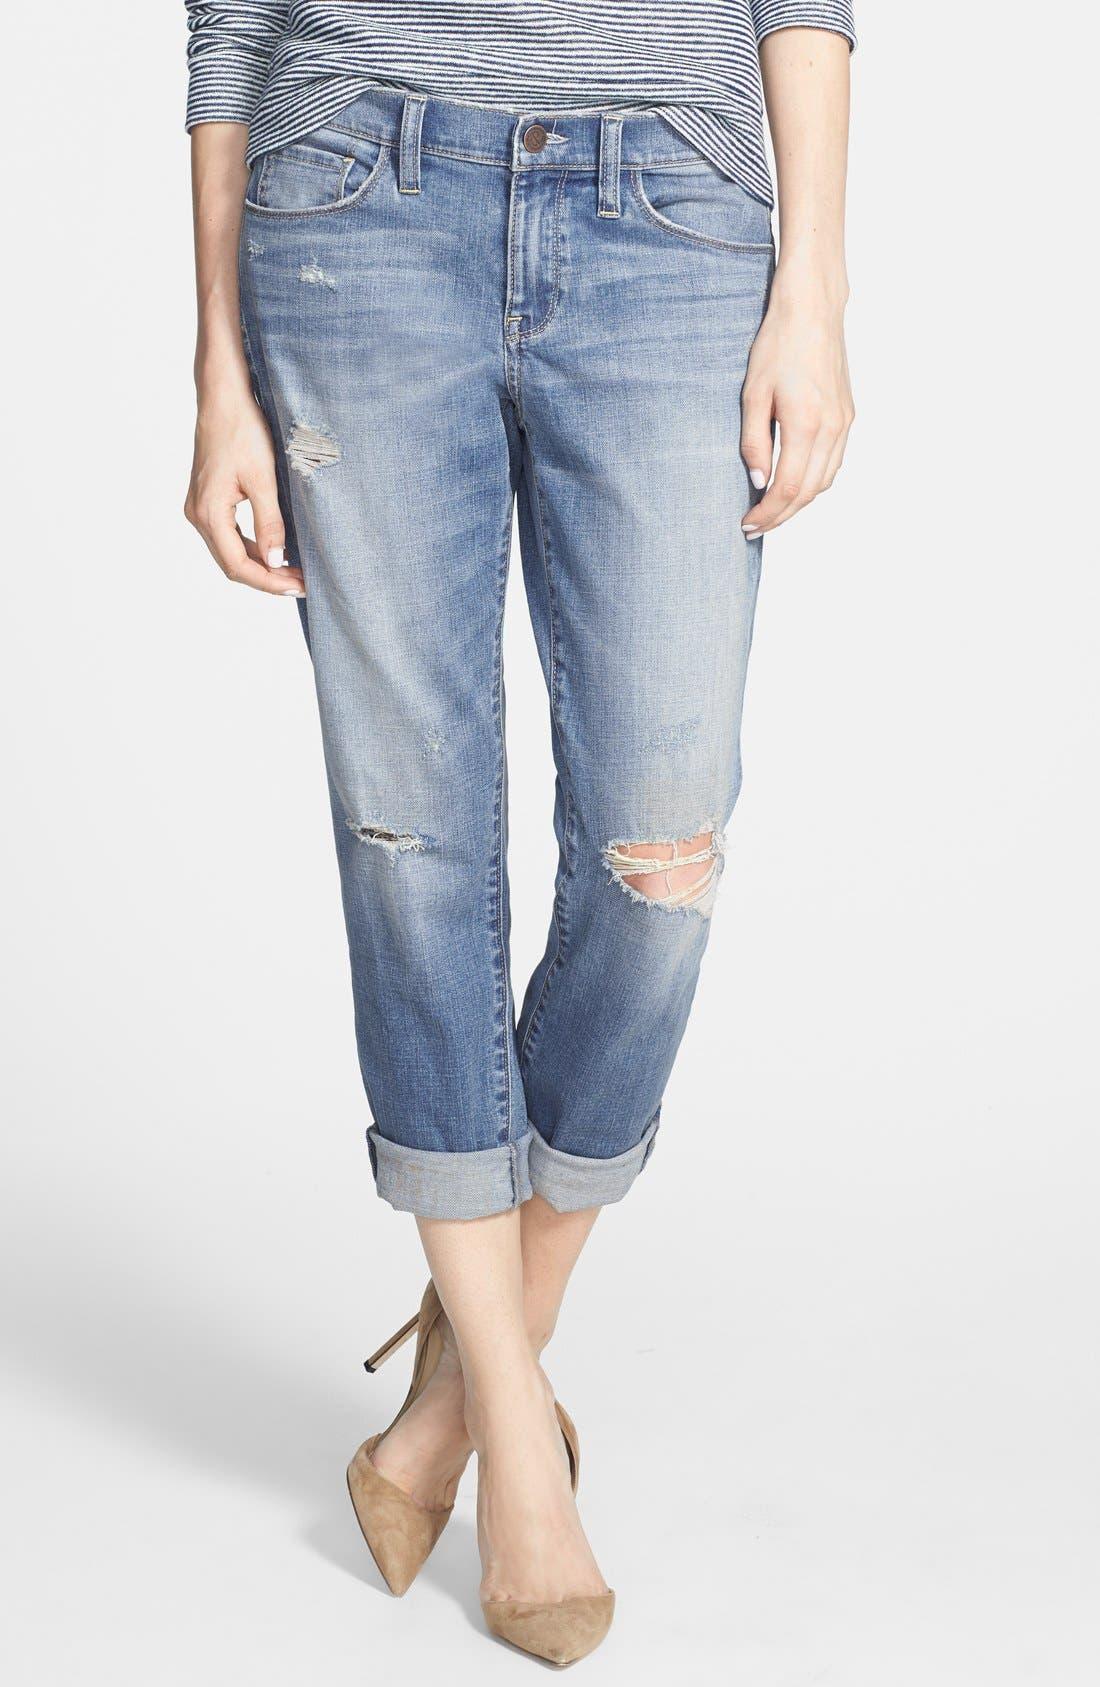 Main Image - Treasure&Bond Denim Boyfriend Jeans (Light Vintage Wash)